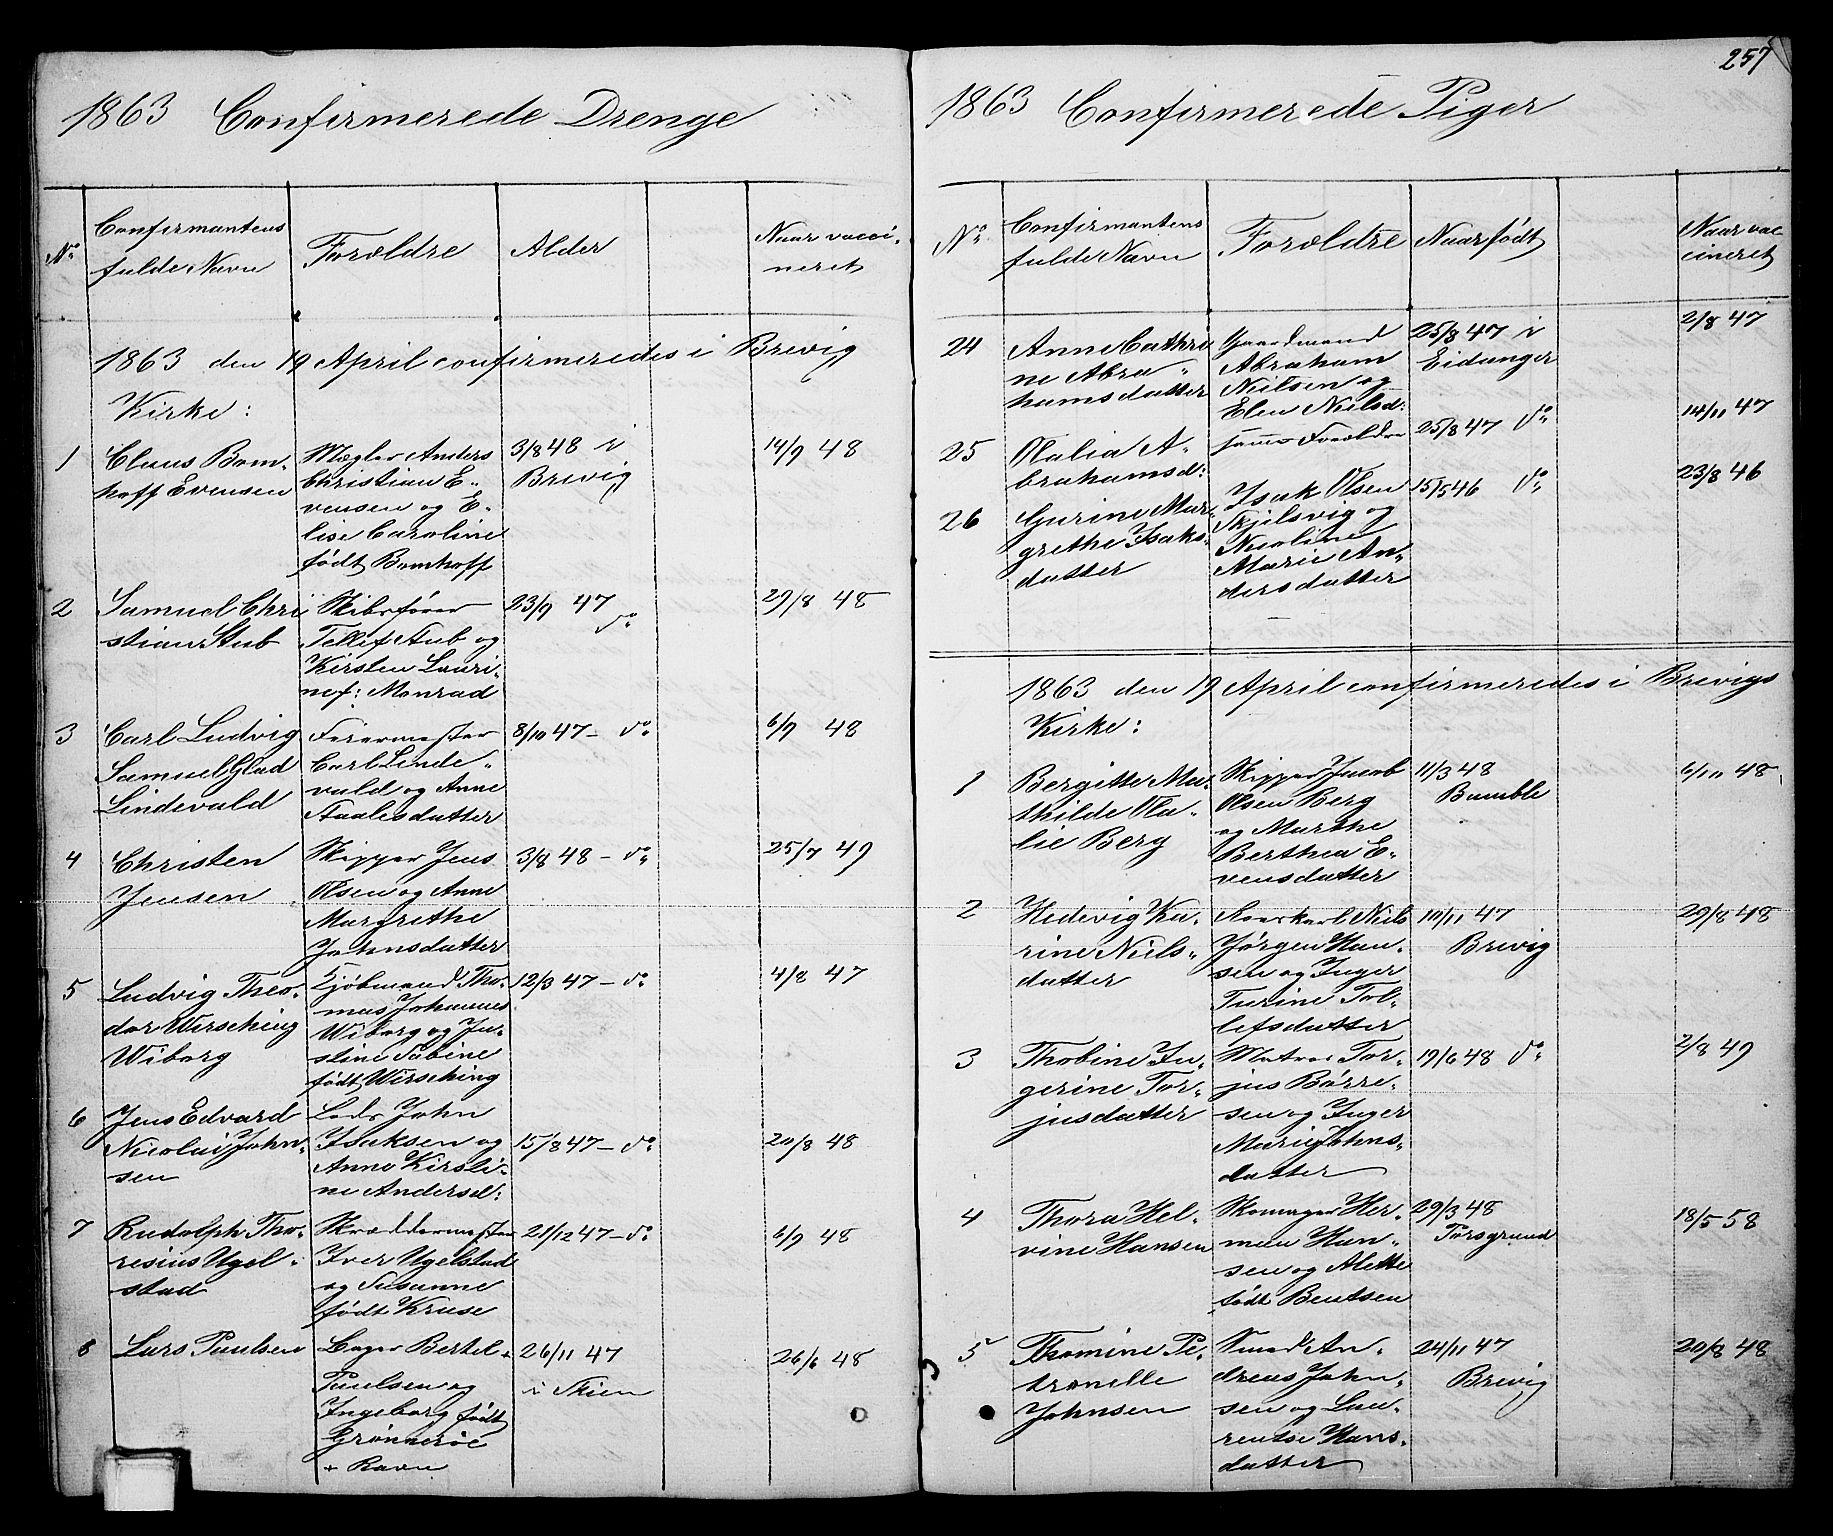 SAKO, Brevik kirkebøker, G/Ga/L0002: Klokkerbok nr. 2, 1846-1865, s. 257